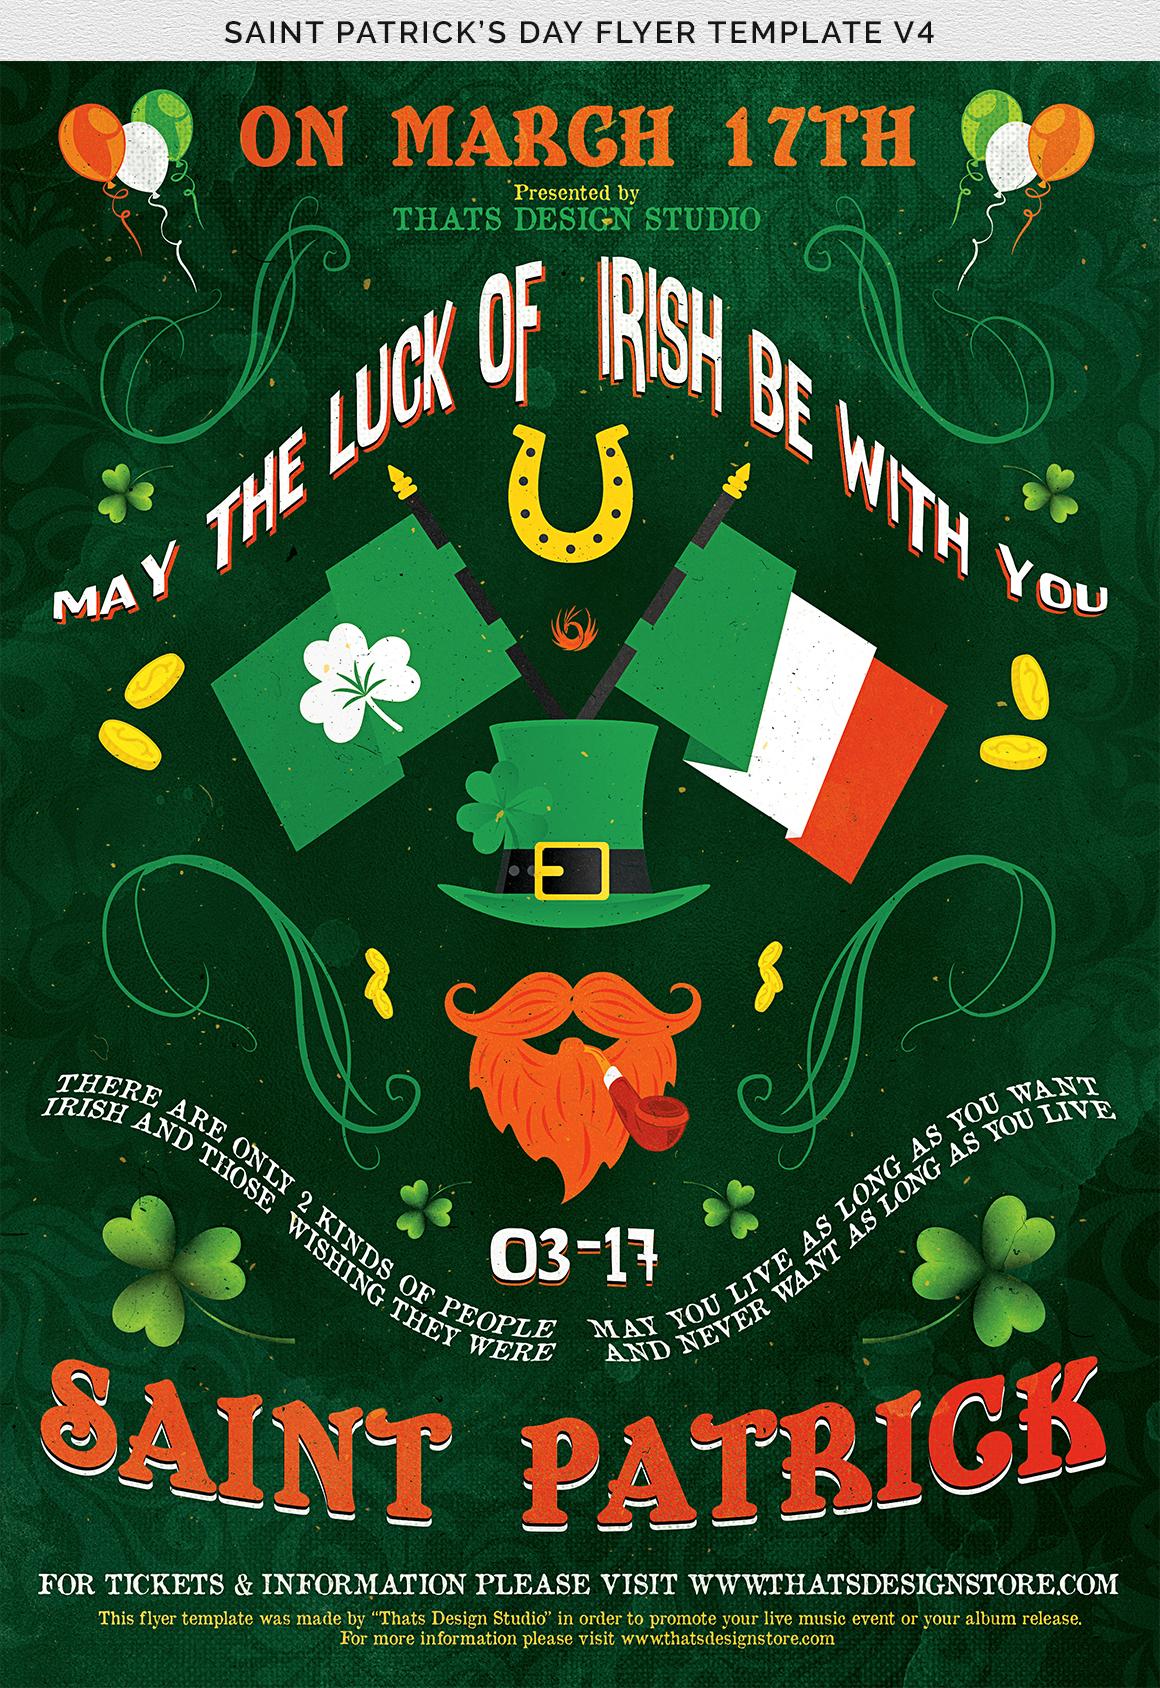 Saint Patricks Day Flyer Template V4 example image 7